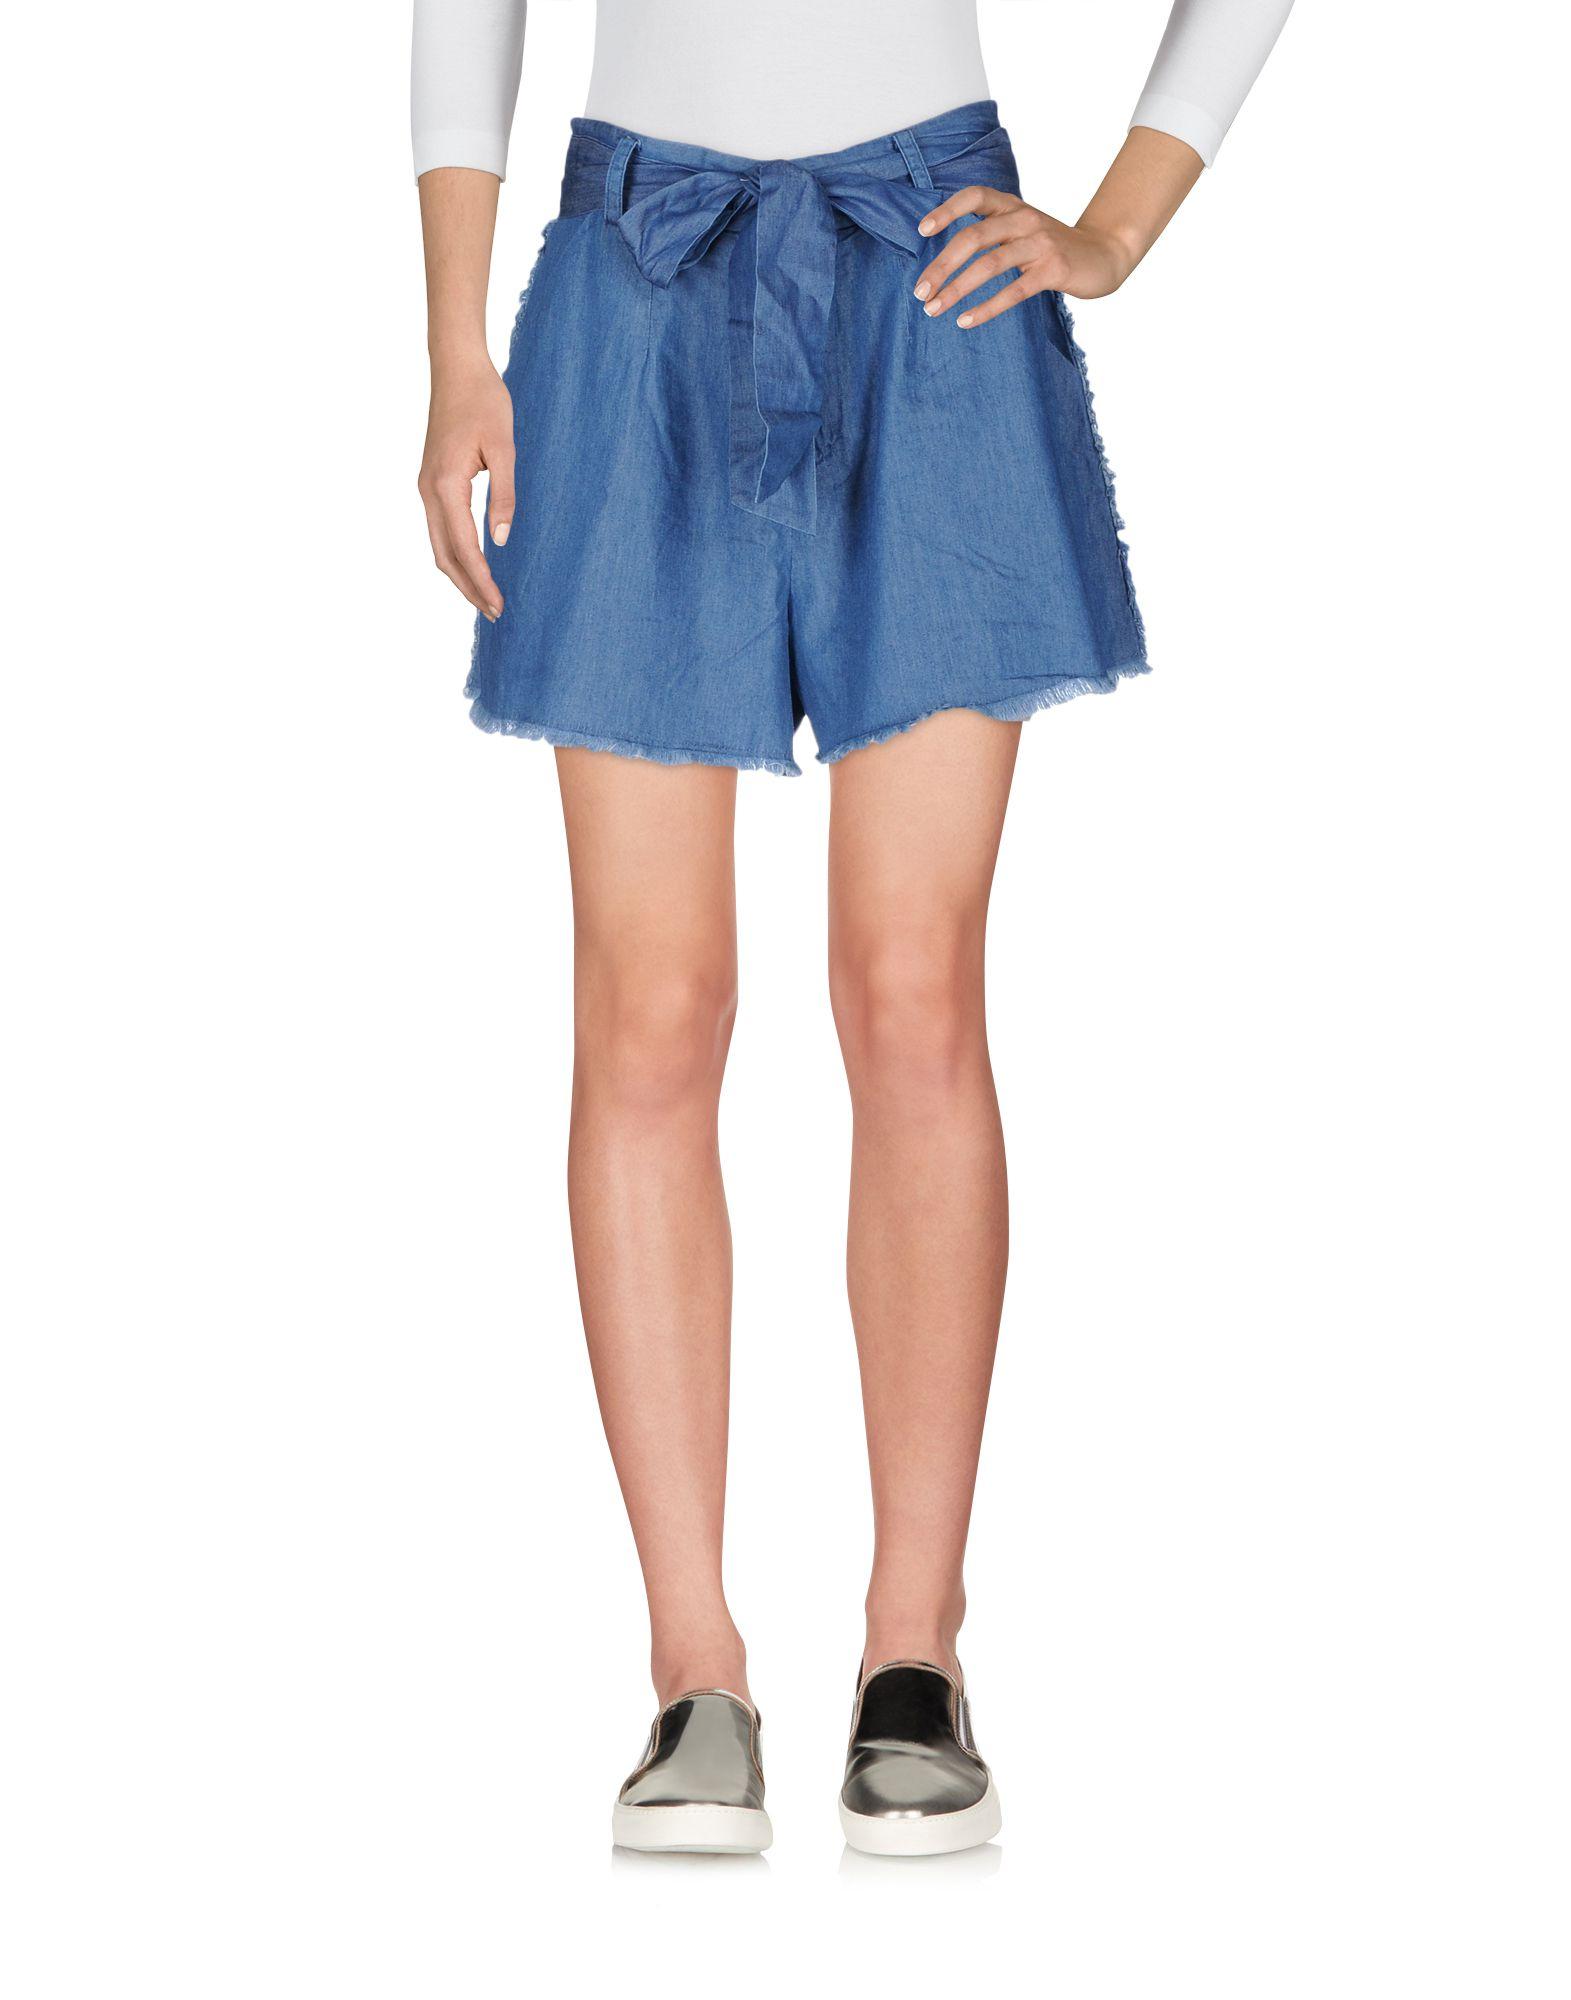 KENDALL + KYLIE Джинсовые шорты шорты джинсовые 3 12 лет